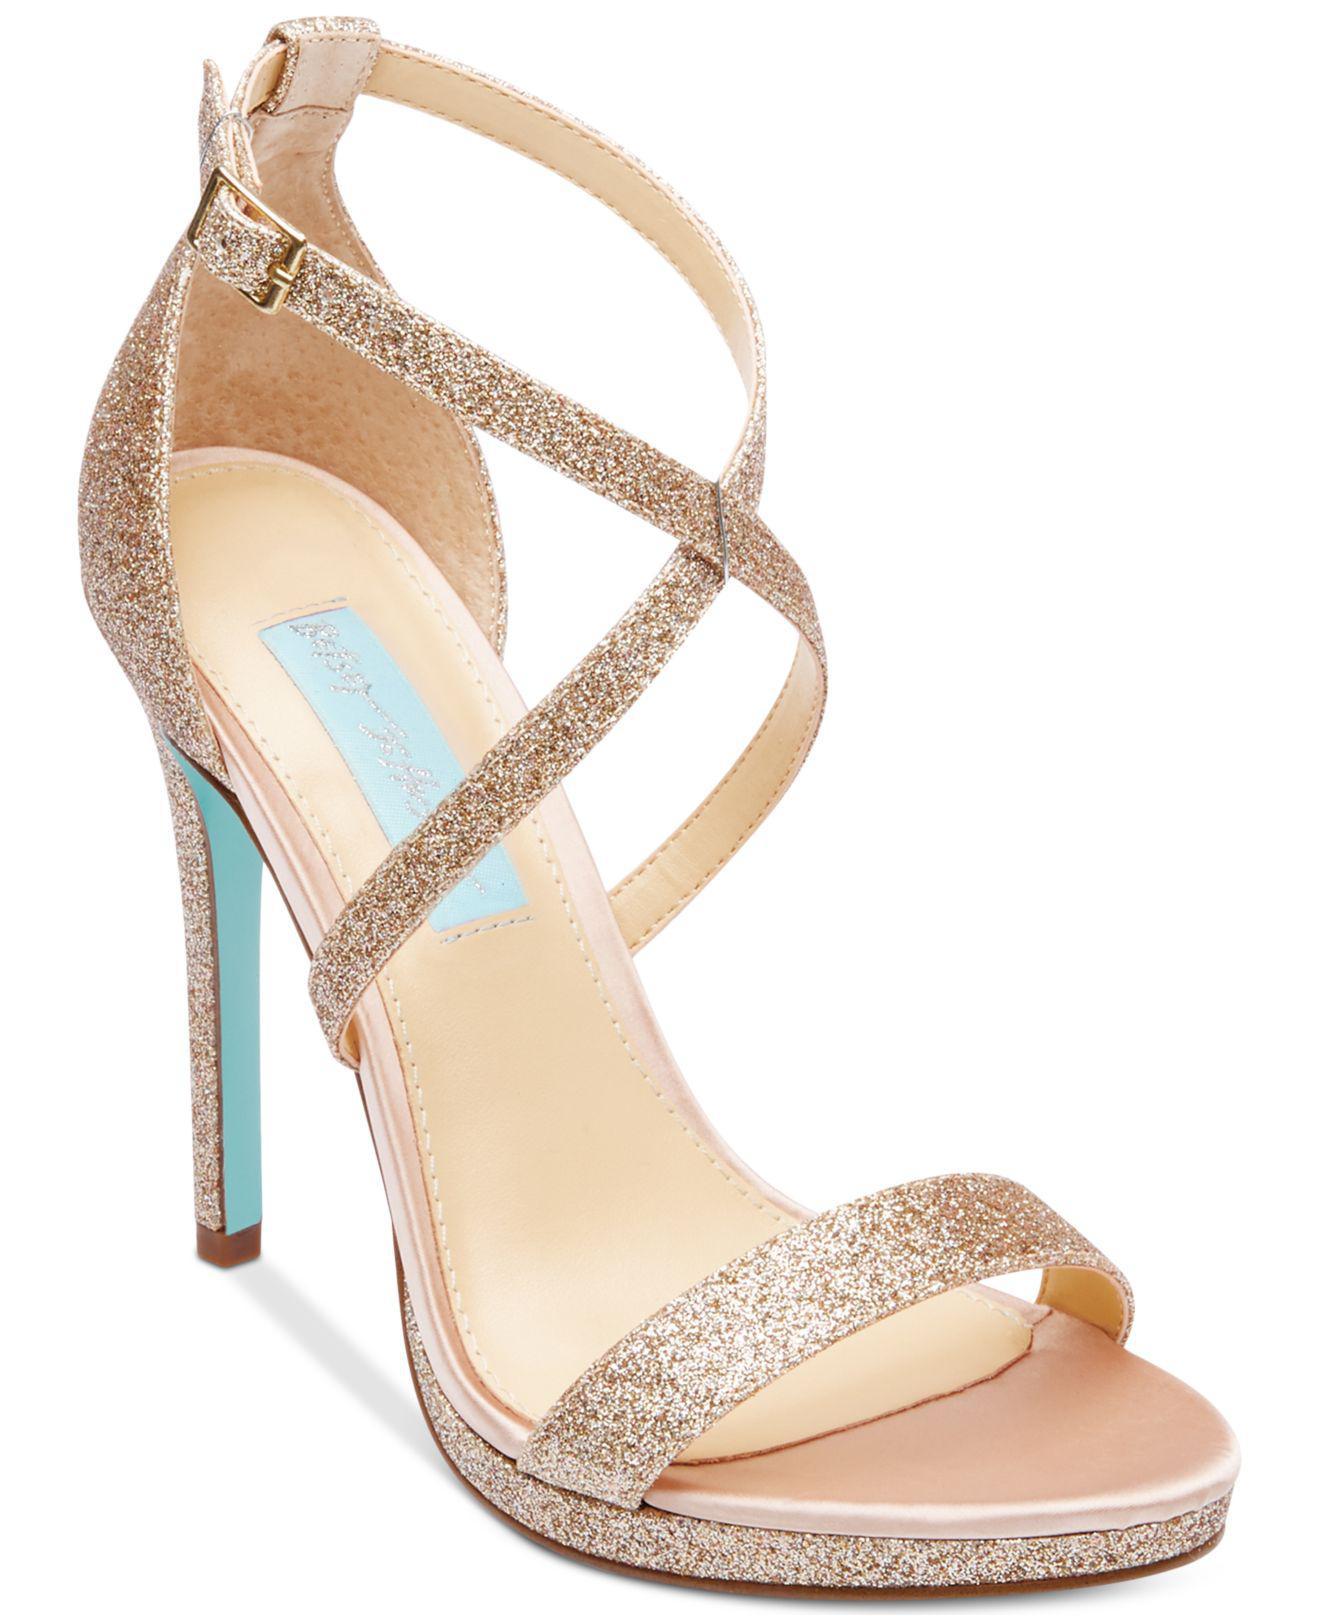 3b852df1d0e Lyst - Betsey Johnson Andi Evening Sandals in Metallic